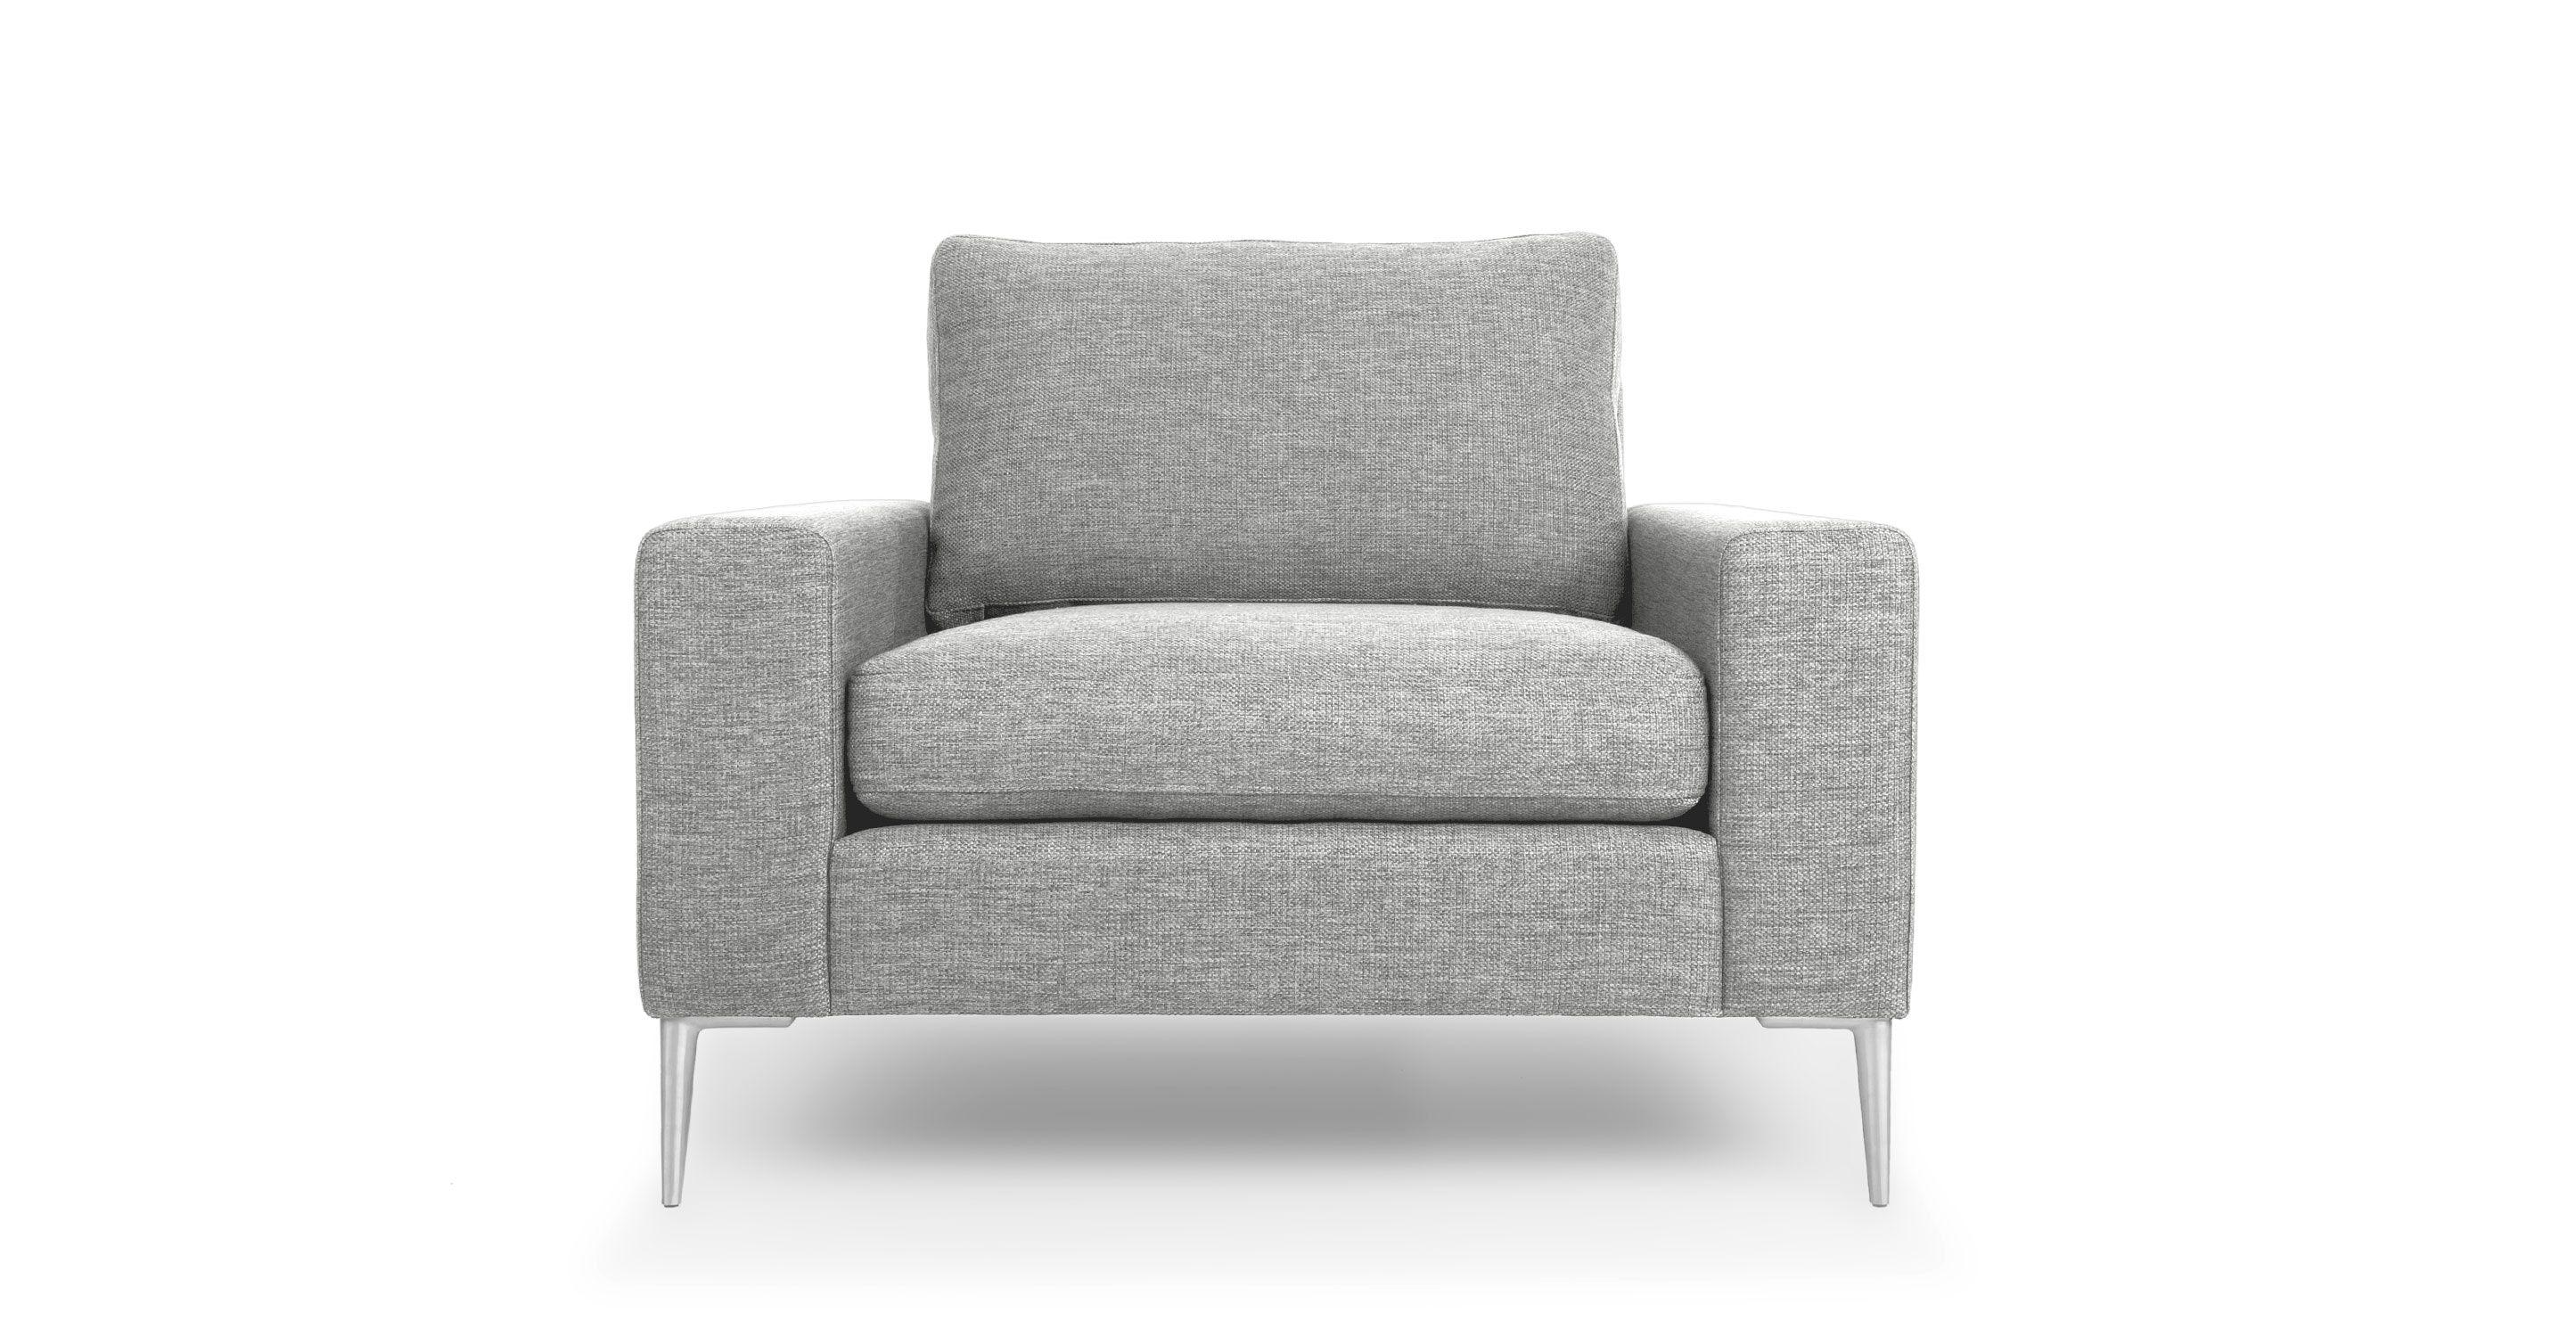 Light Gray Armchair With Metal Legs Article Nova Modern